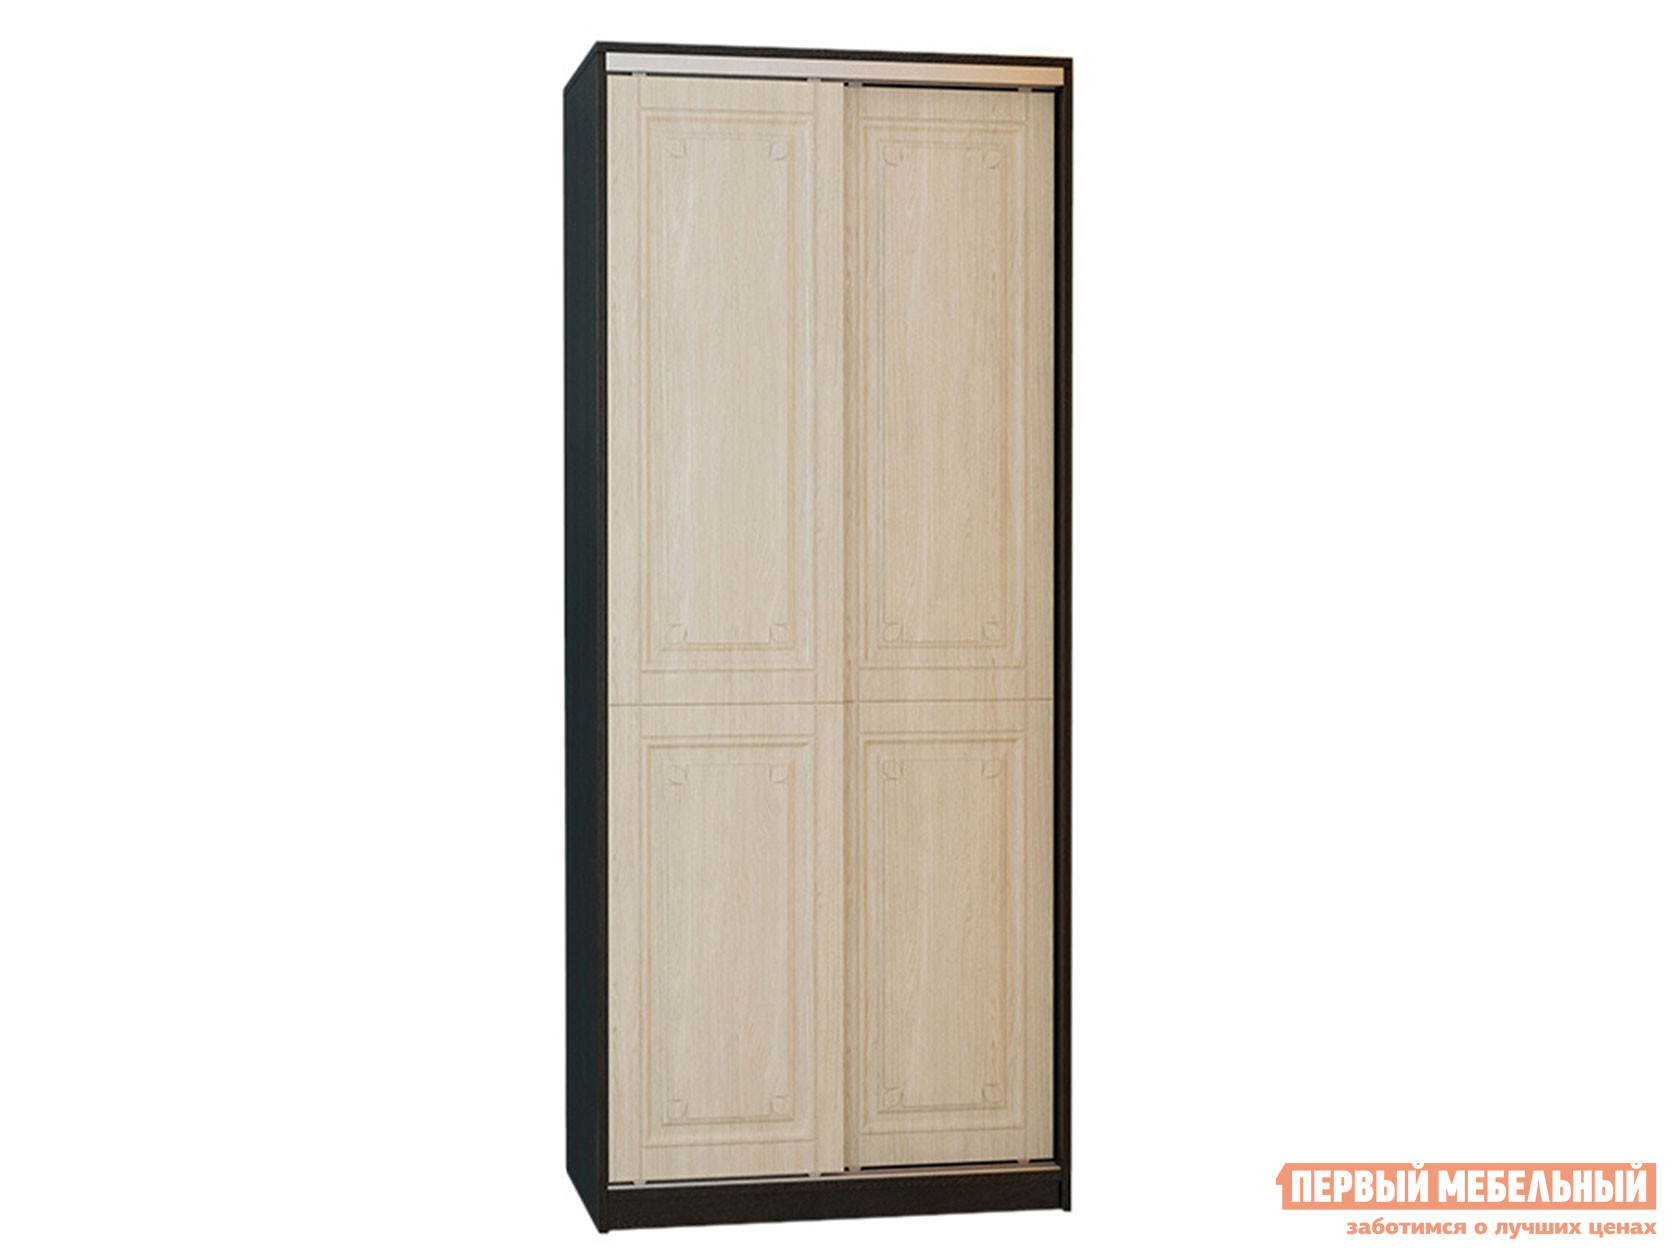 Узкий шкаф-купе МО РОСТ Шкаф-купе 2-х дверный 804